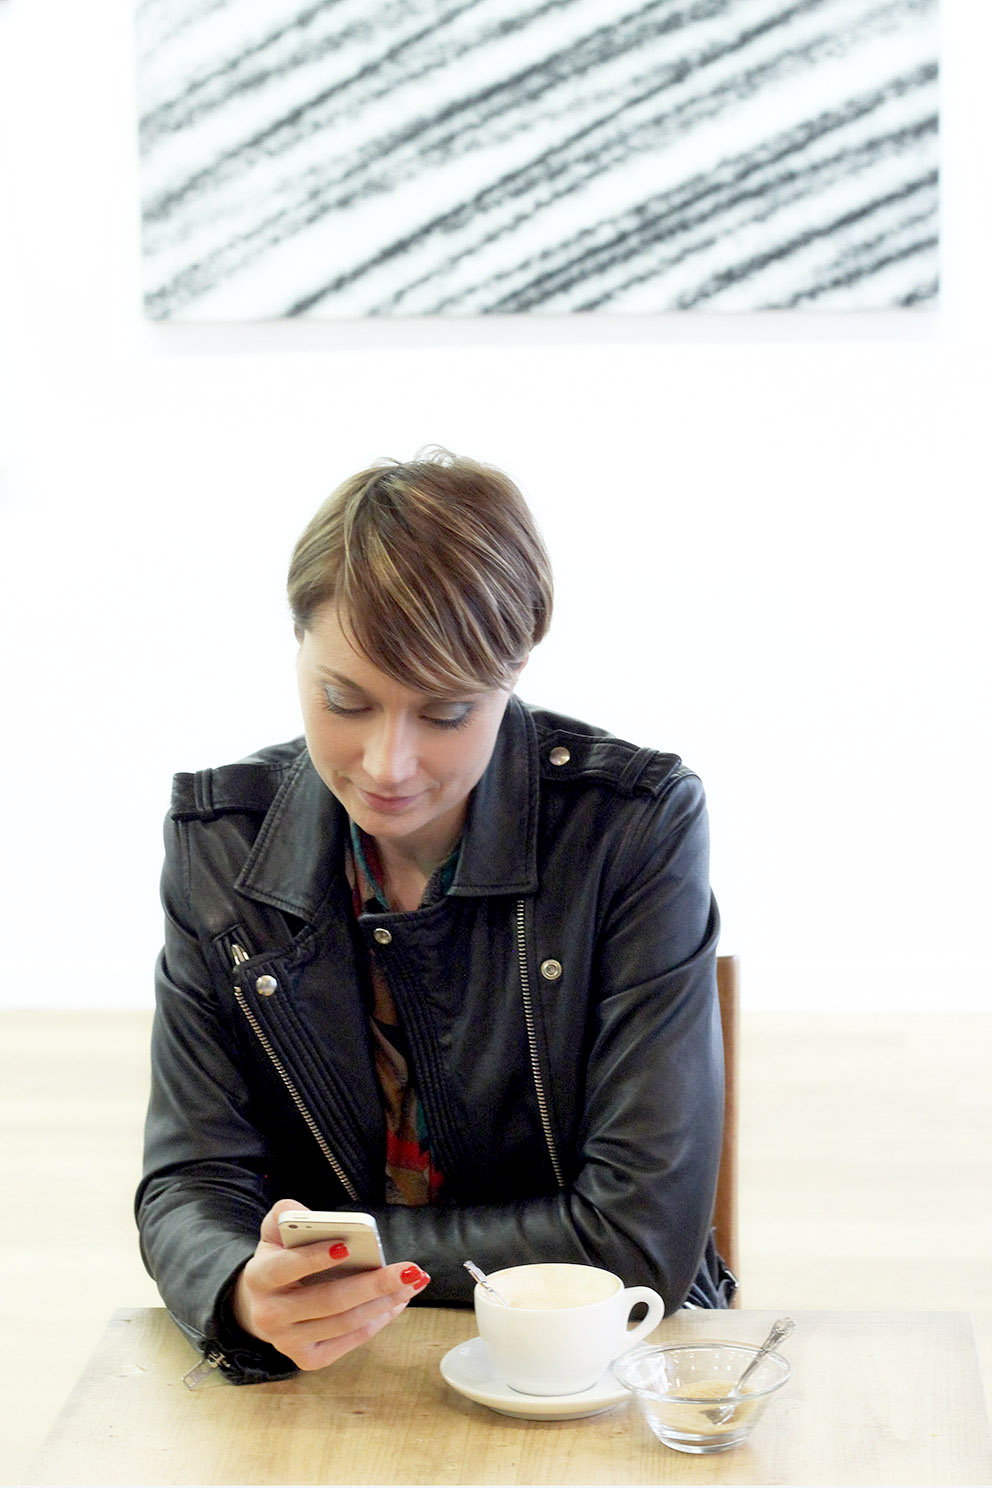 Artlex blogueuse lyonnaise Slika